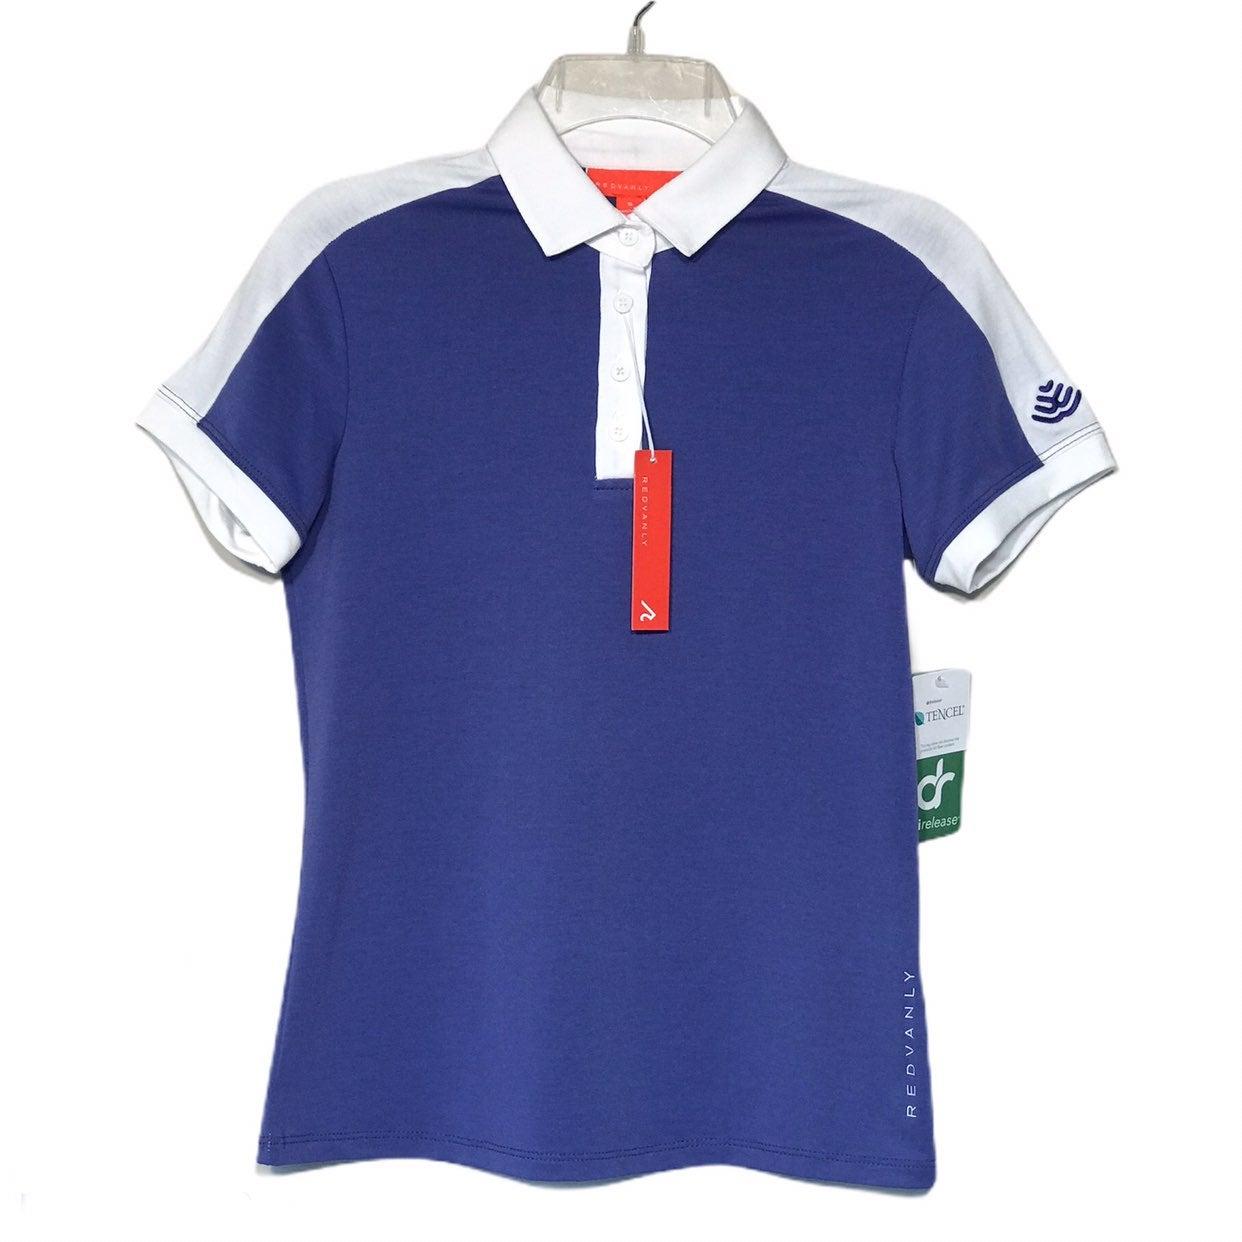 Redvanly DriRelease Tencel Golf Top